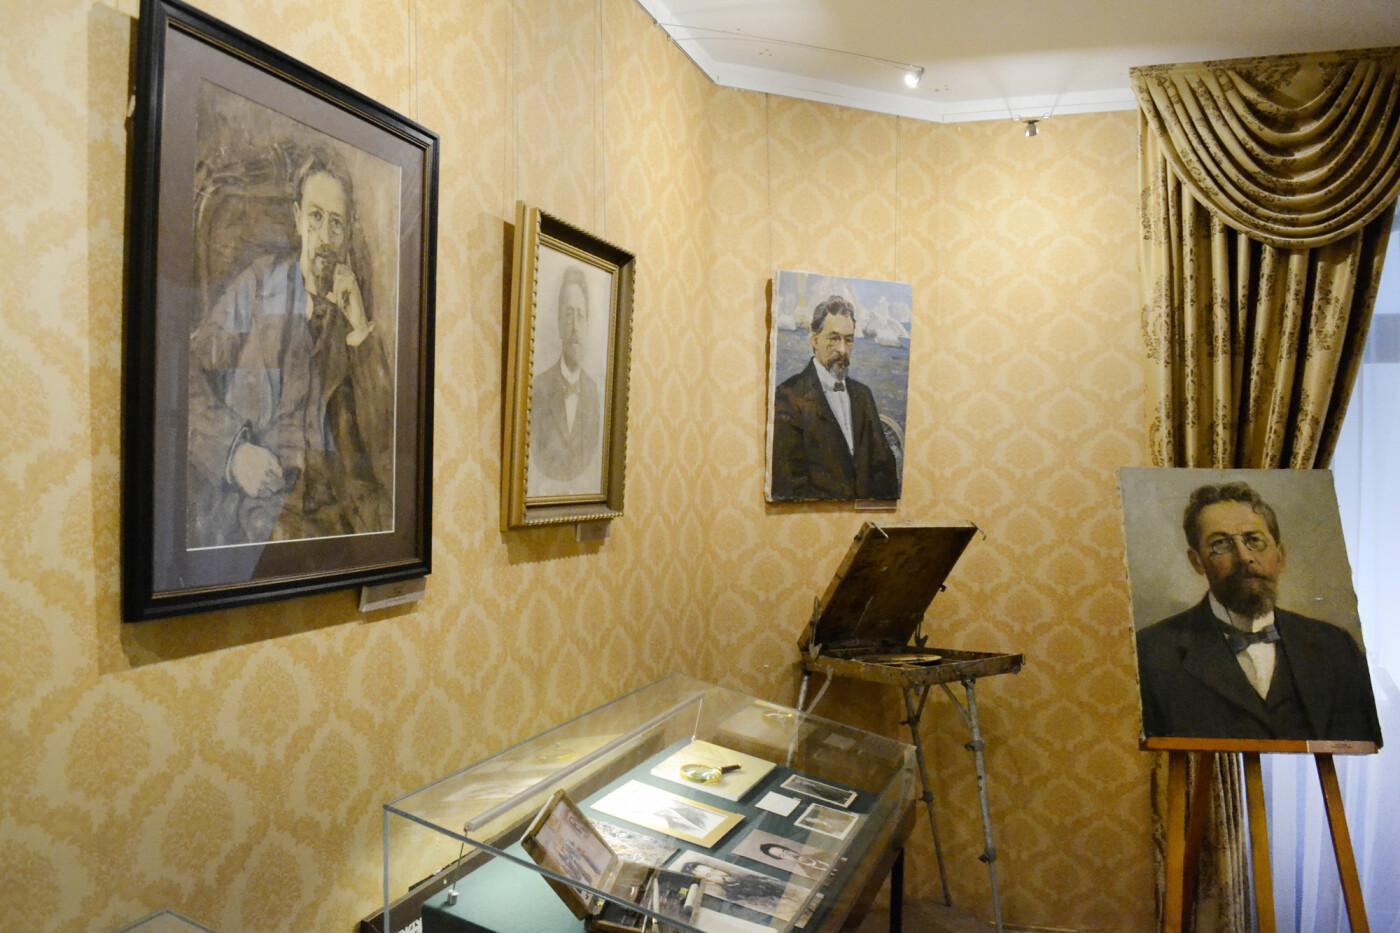 Как Ялта отметила 160 лет со дня рождения Антона Павловича Чехова, фото-3